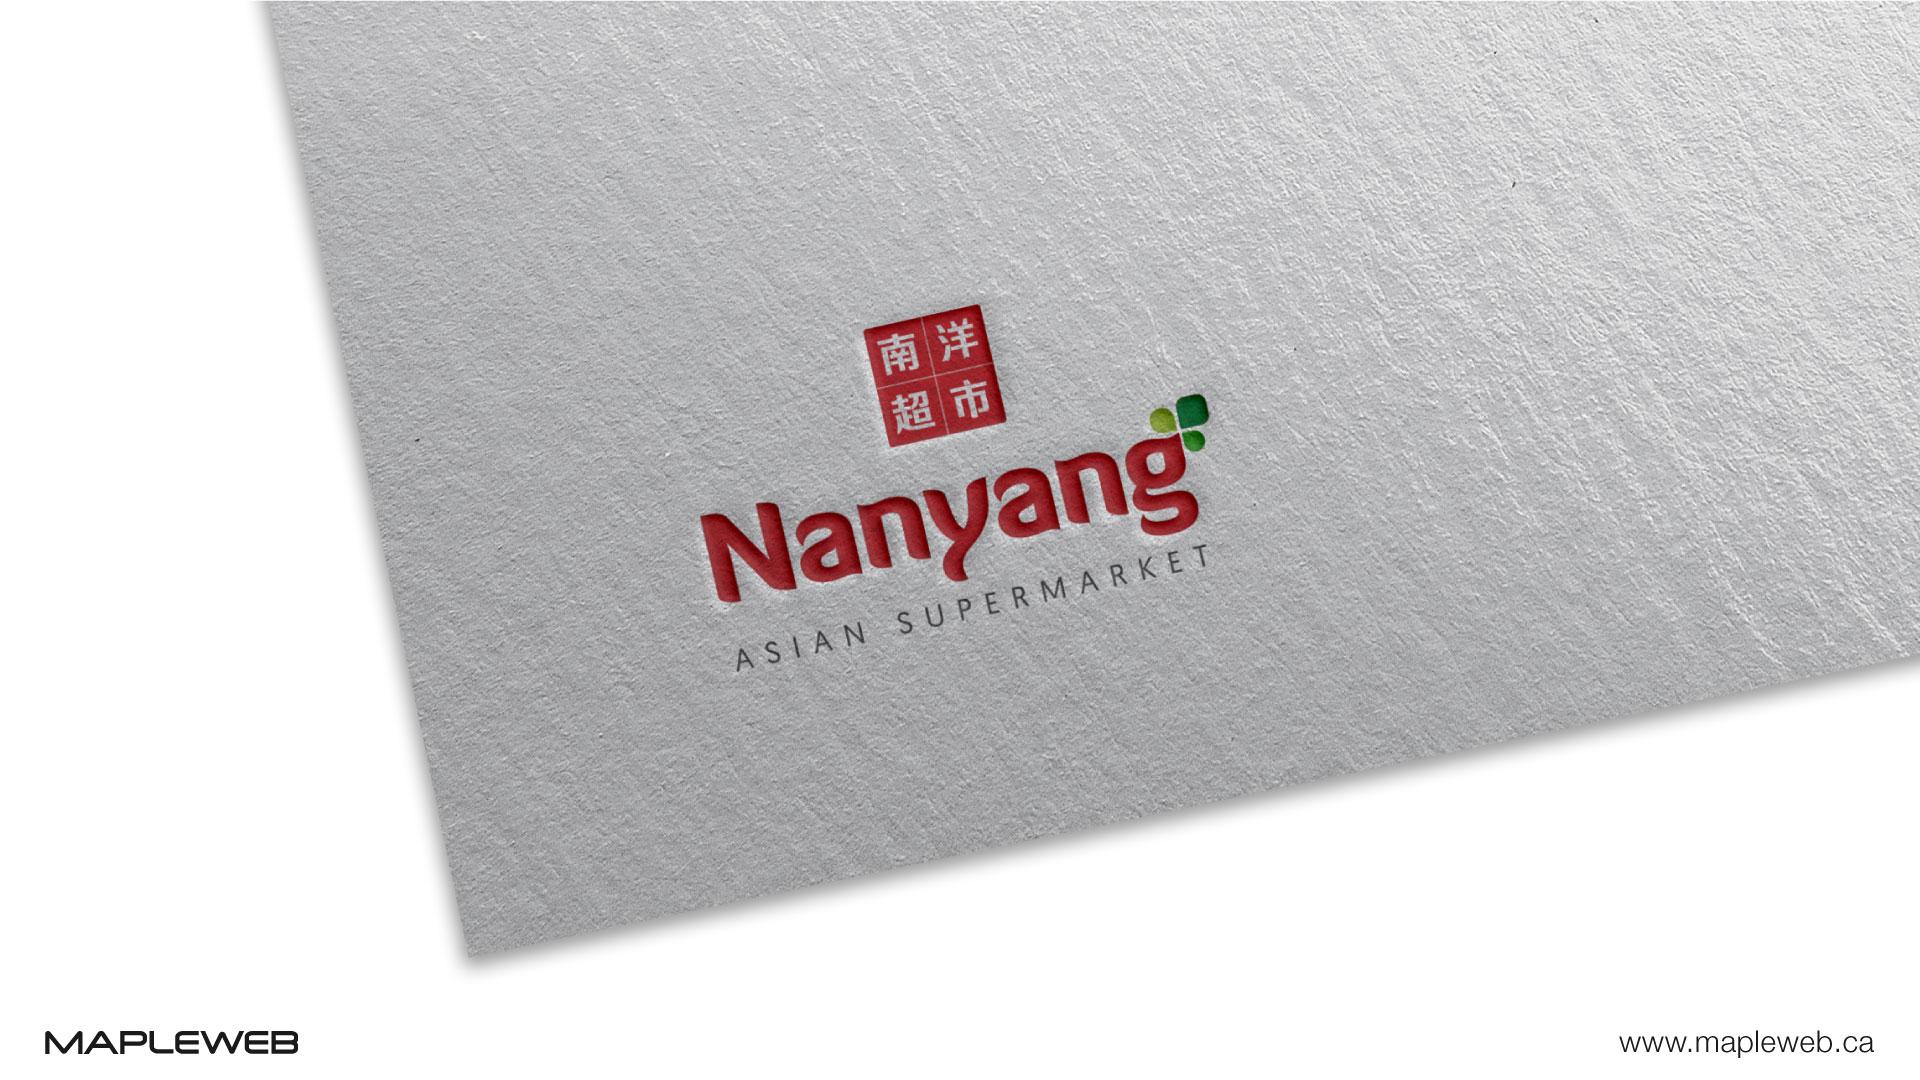 nanyang-brand-logo-design-by-mapleweb-vancouver-canada-white-paper-mock